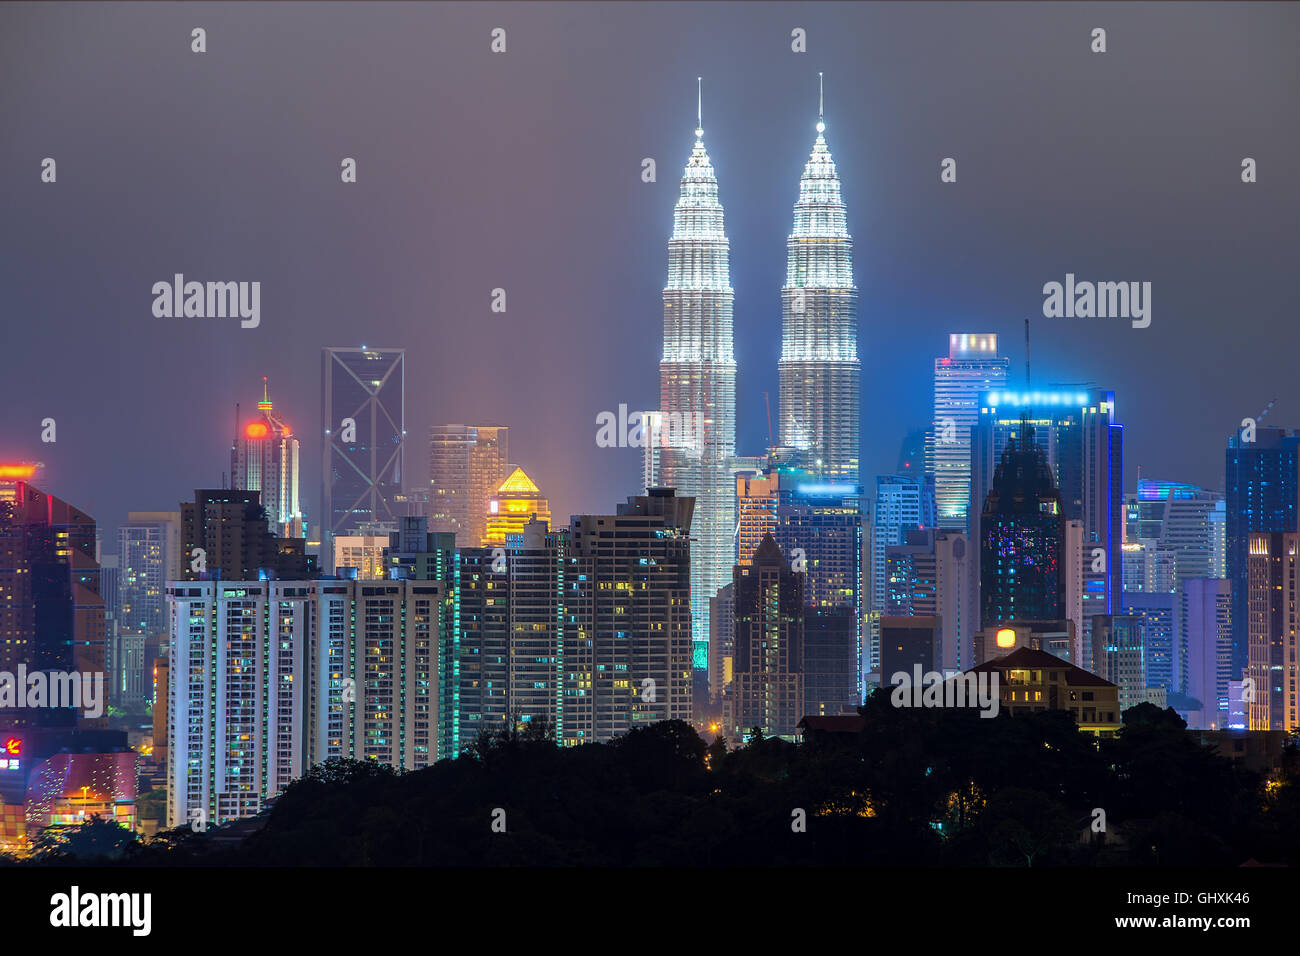 En la noche de Kuala Lumpur, Kuala Lumpur, Malasia Imagen De Stock